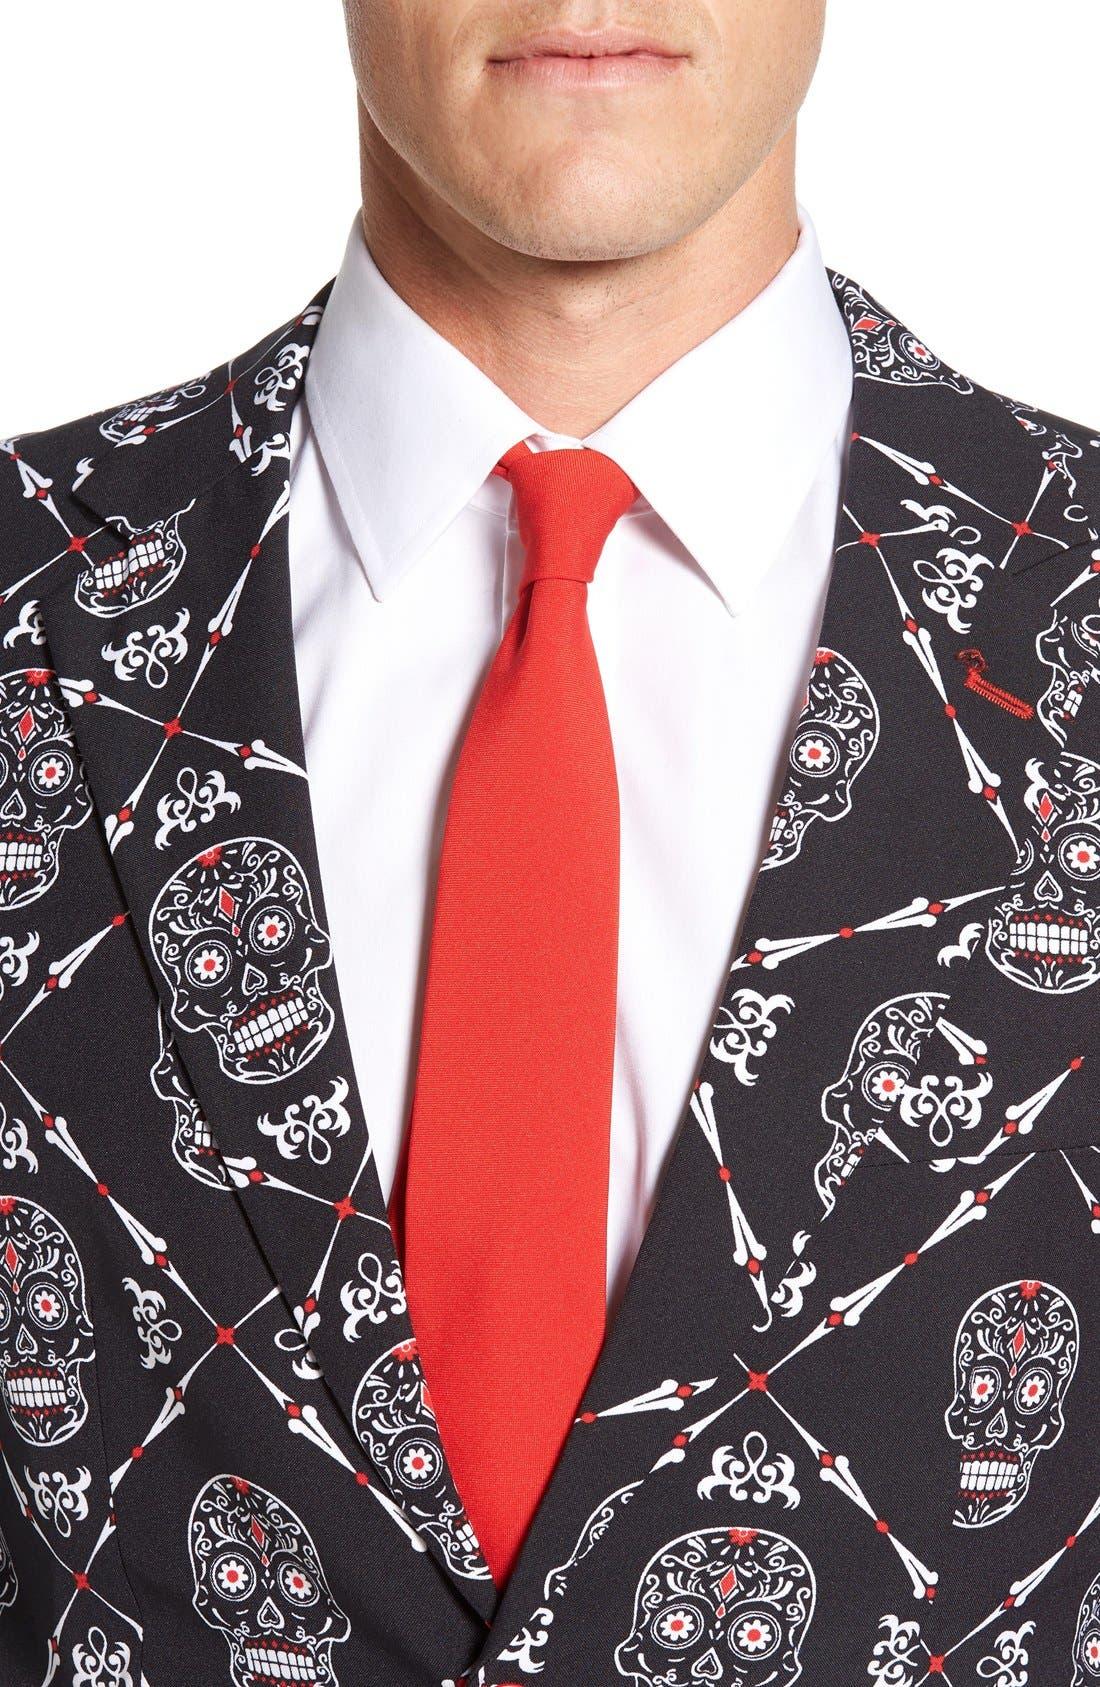 'Haunting Hombre' Trim Fit Suit with Tie,                             Alternate thumbnail 5, color,                             001